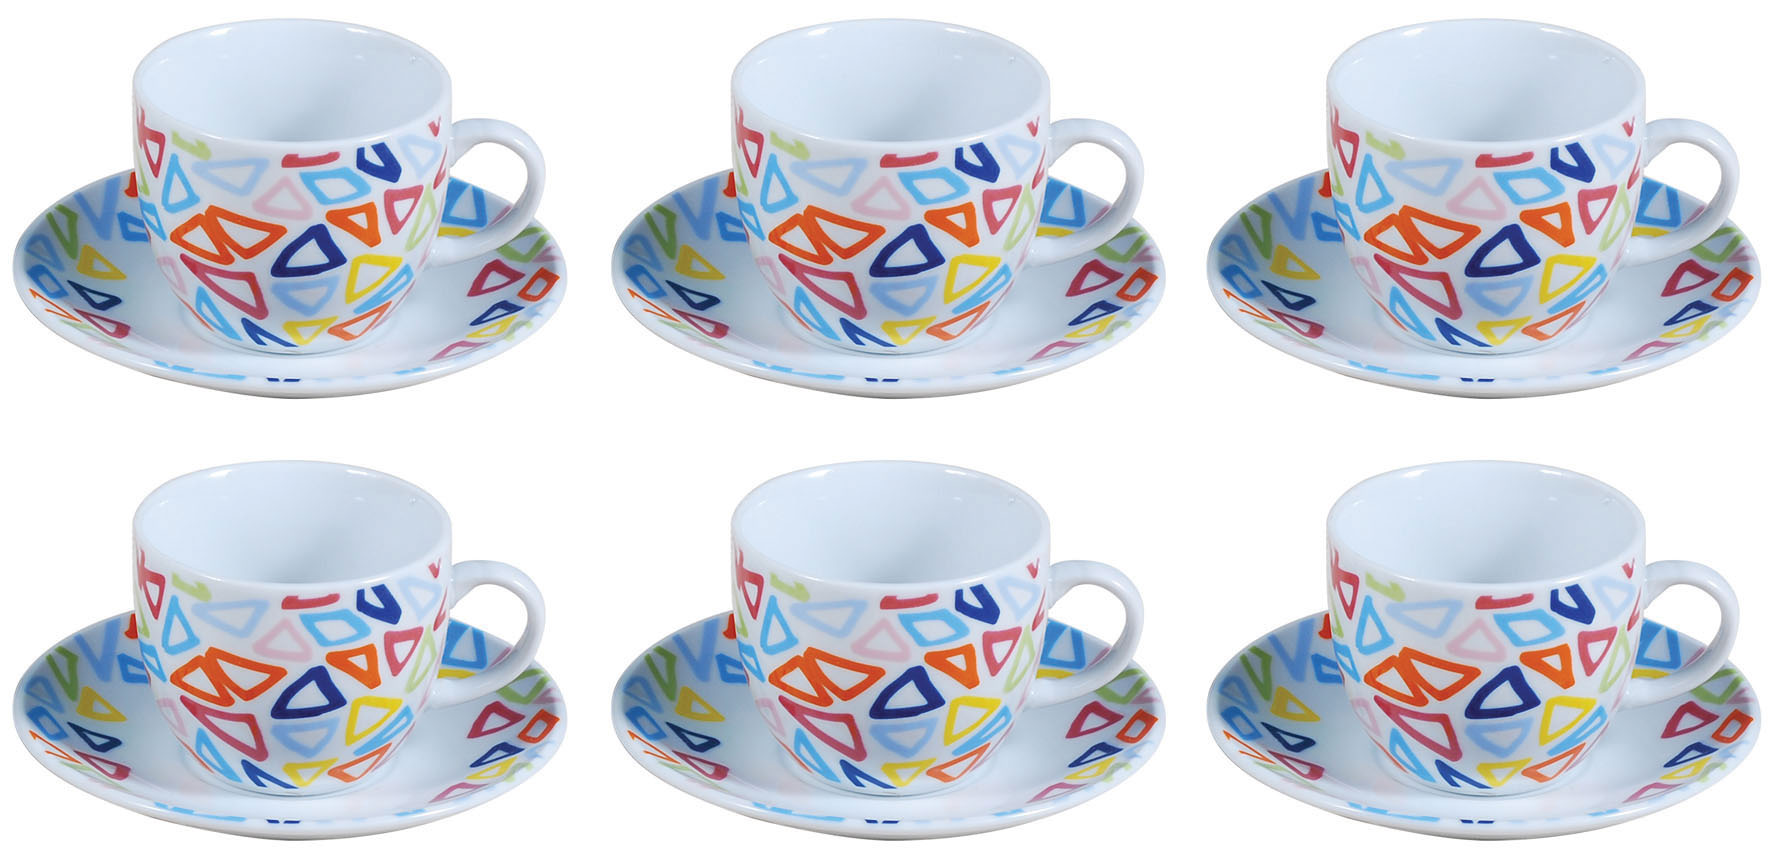 TAZZ CAFFE C P PZ 6 LETIZIA